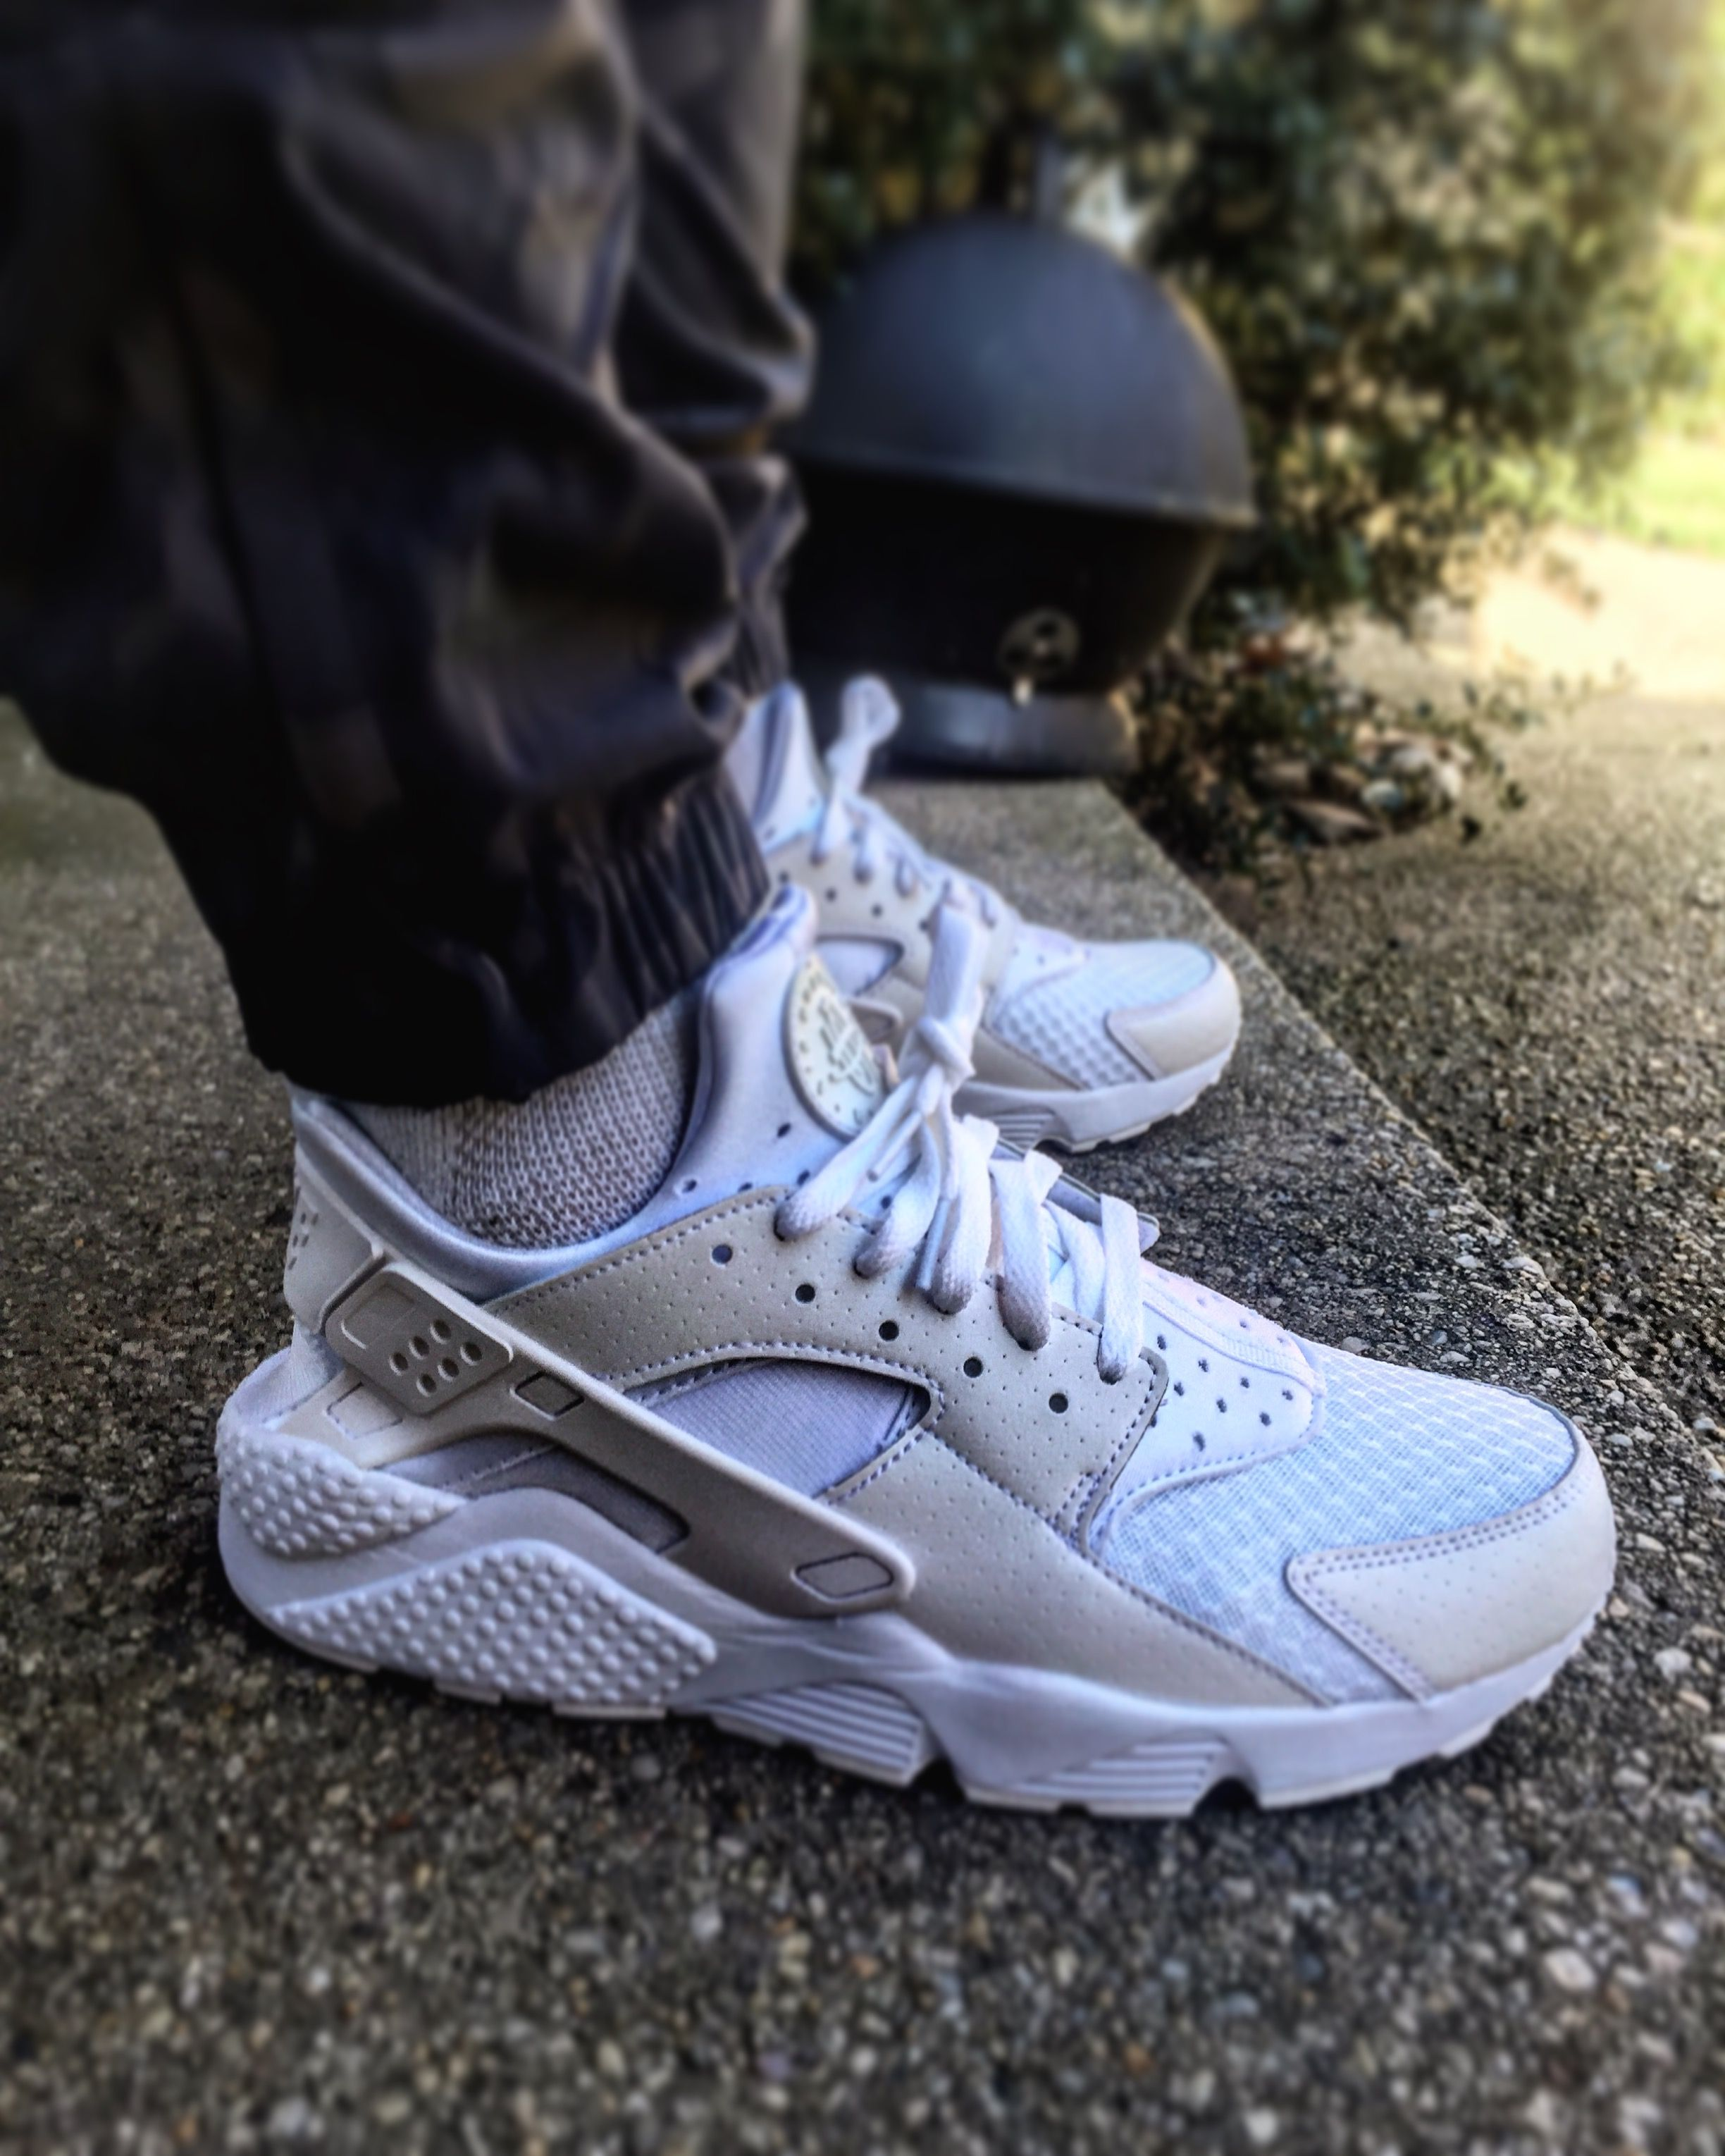 And W Huaraches White Triple Camo Nike Joggers Air Shoes Z8ZUx